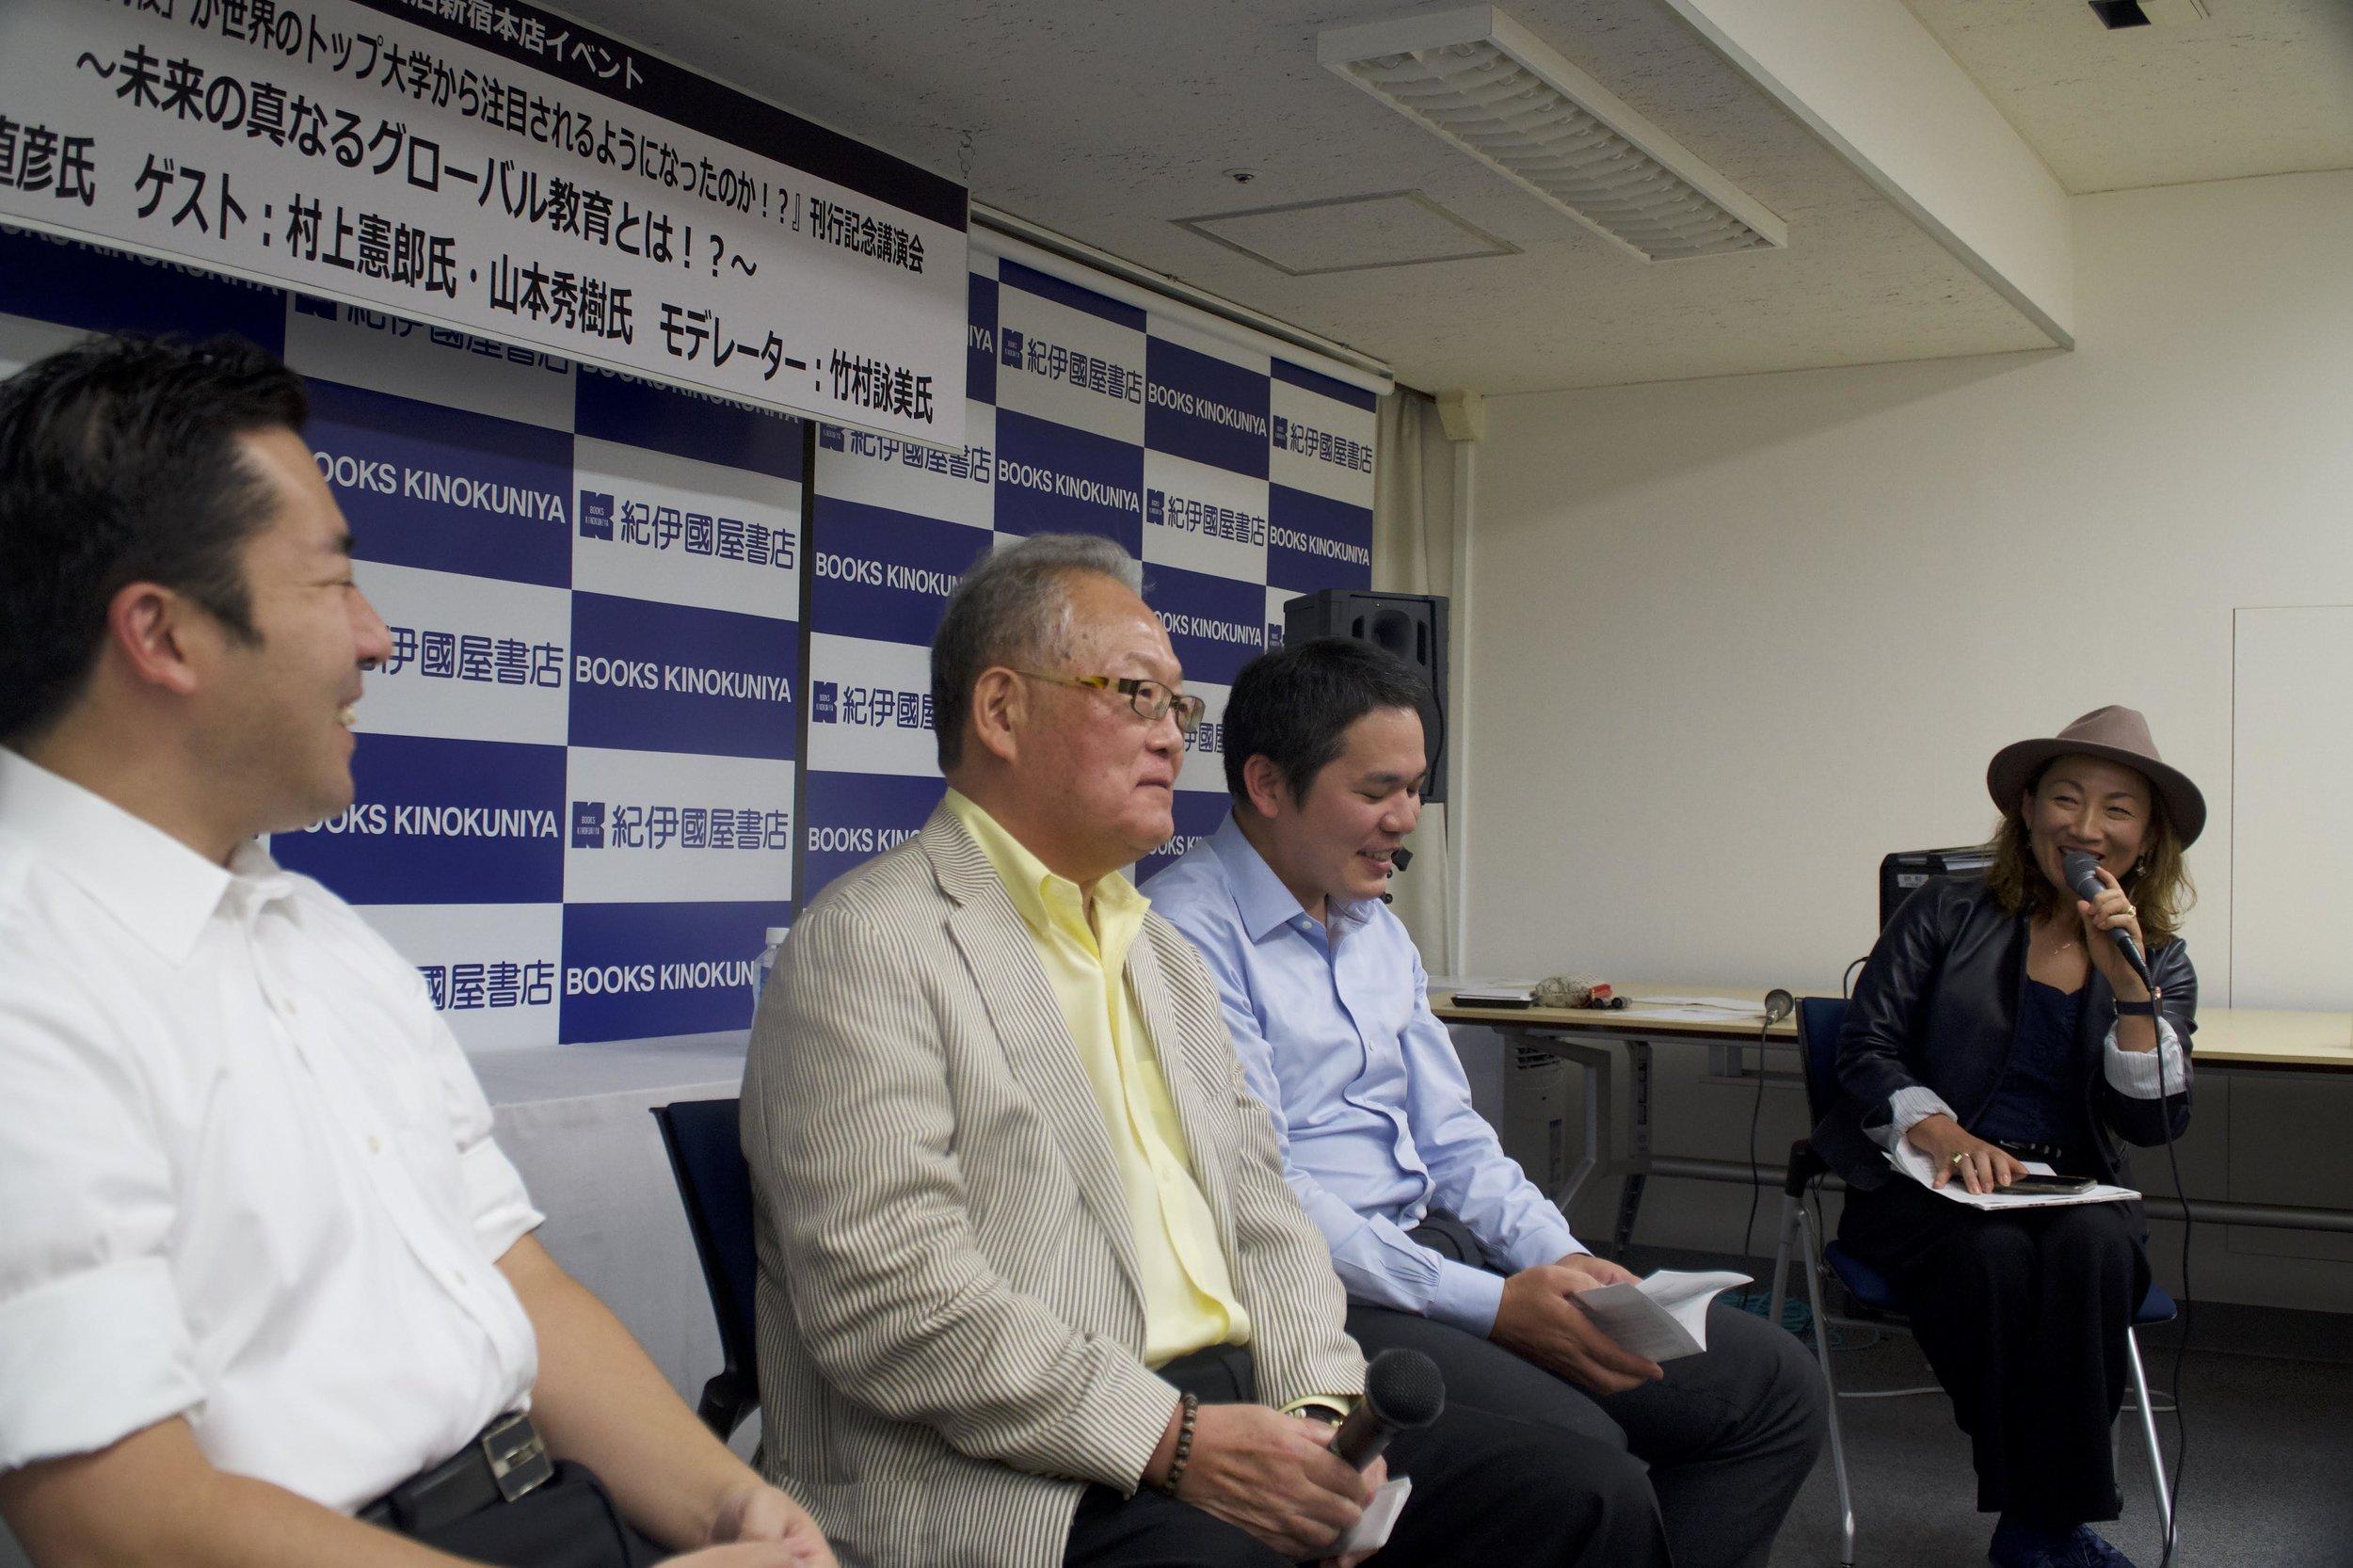 左から:日野田校長、村上氏、山本氏、竹村